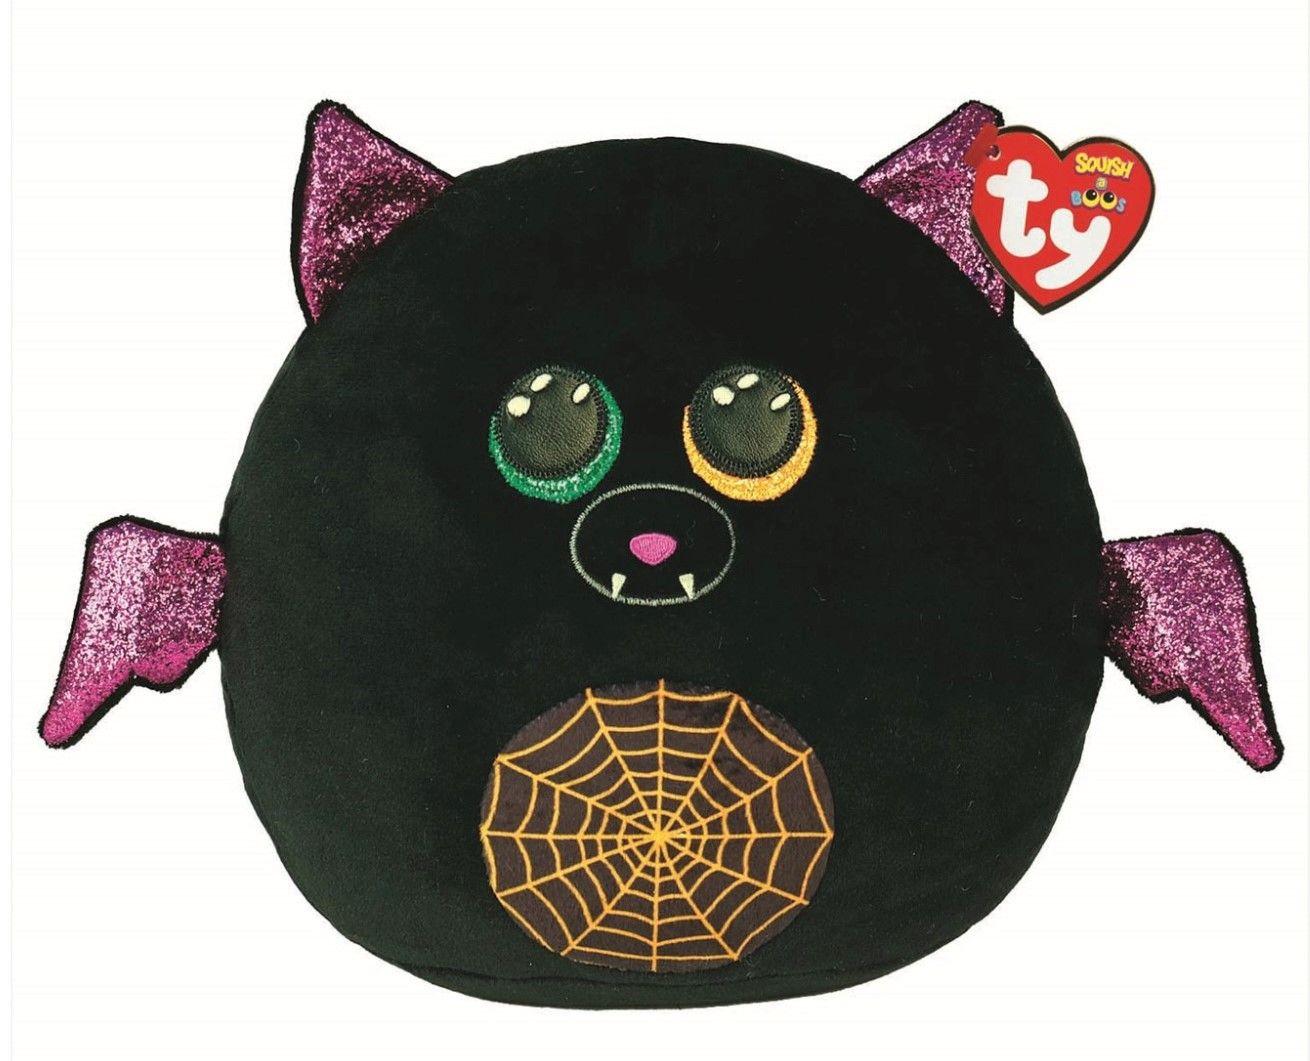 "Ty Eerie Halloween Bat Squish-a-boo 10"" 39305"